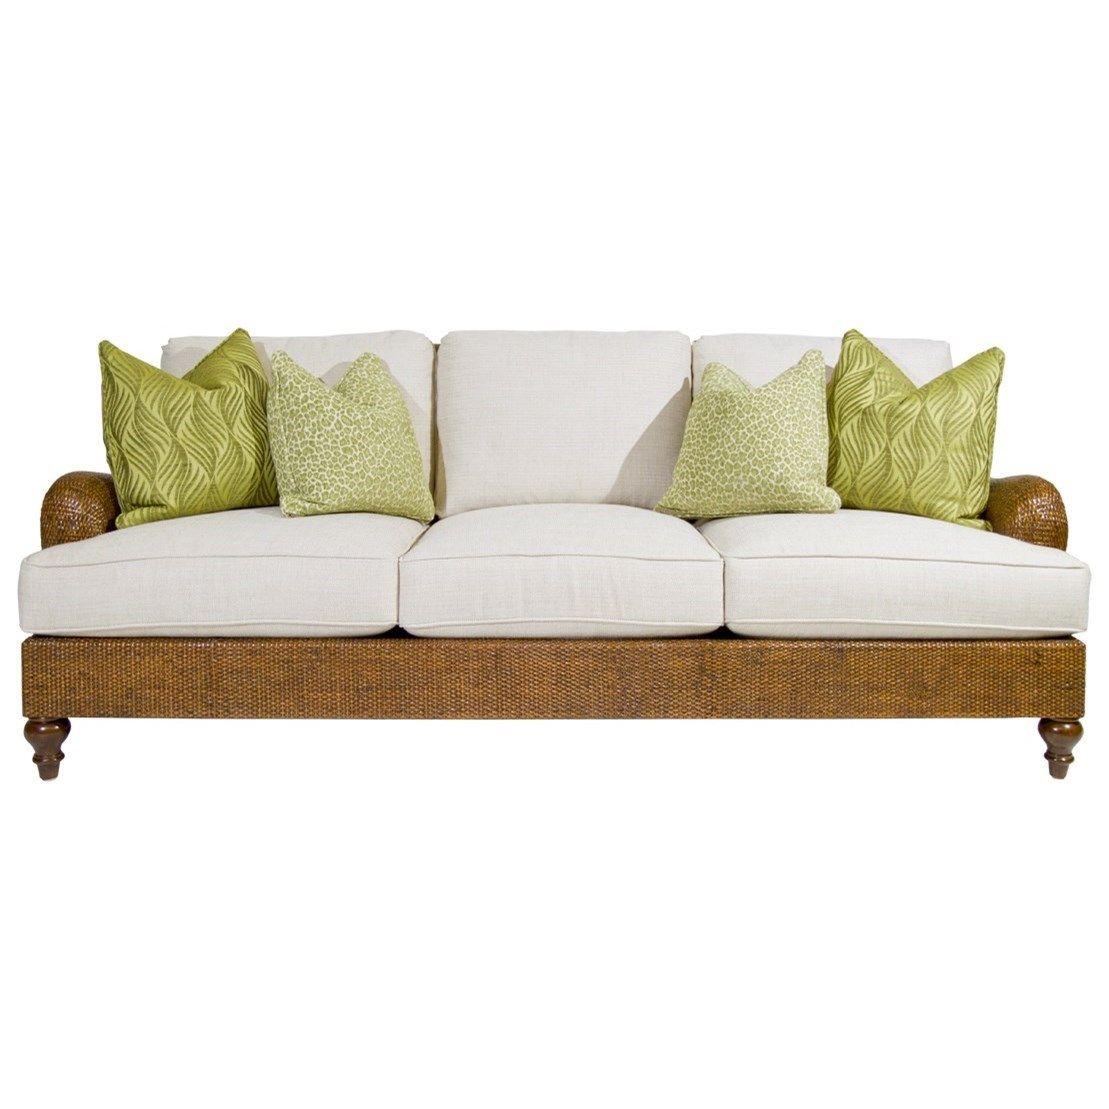 Bali Hai Harborside Sofa by Tommy Bahama Home at Hudson\'s Furniture ...